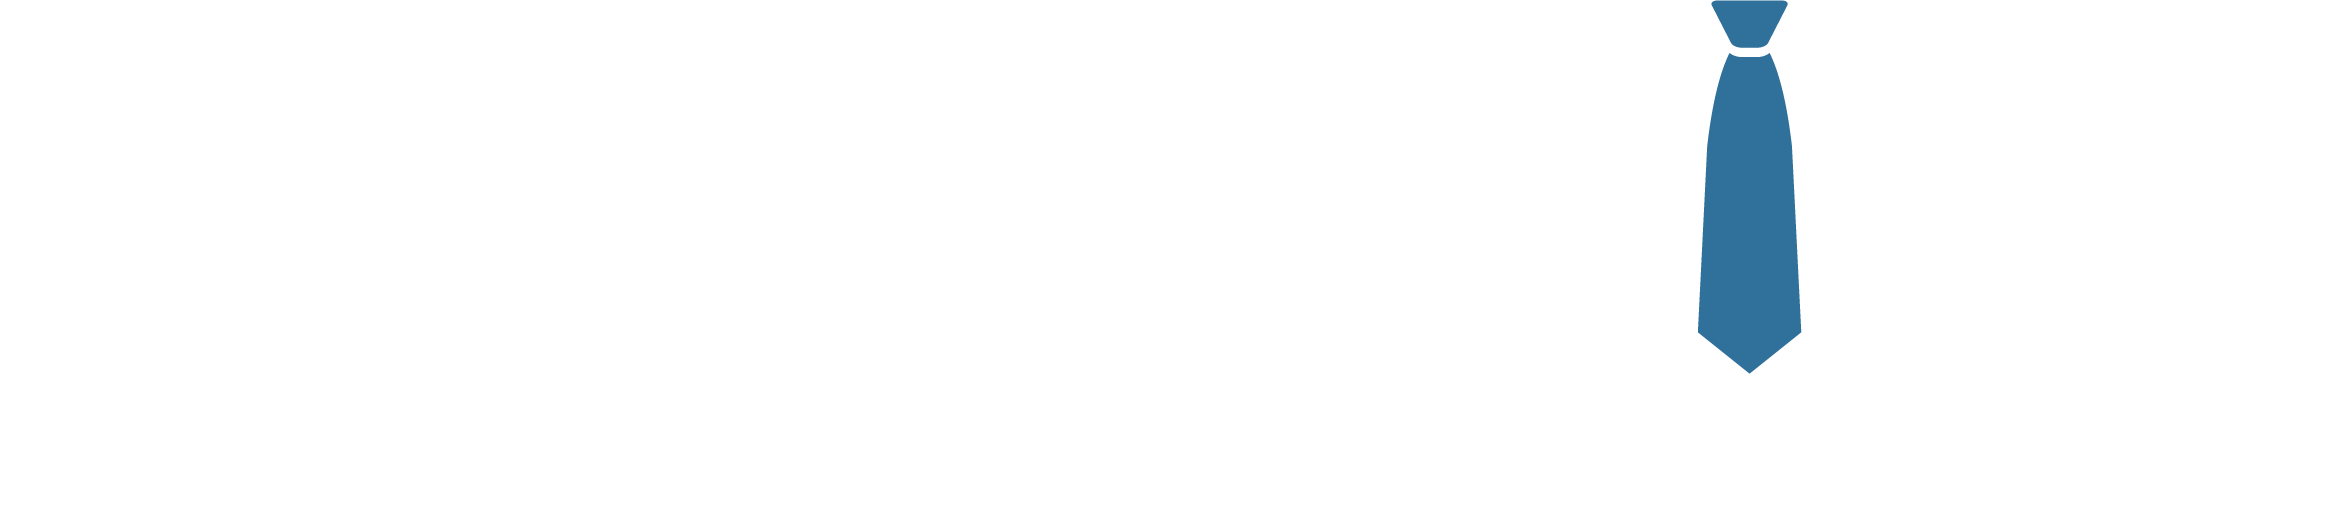 Executive Pest Control Products logo